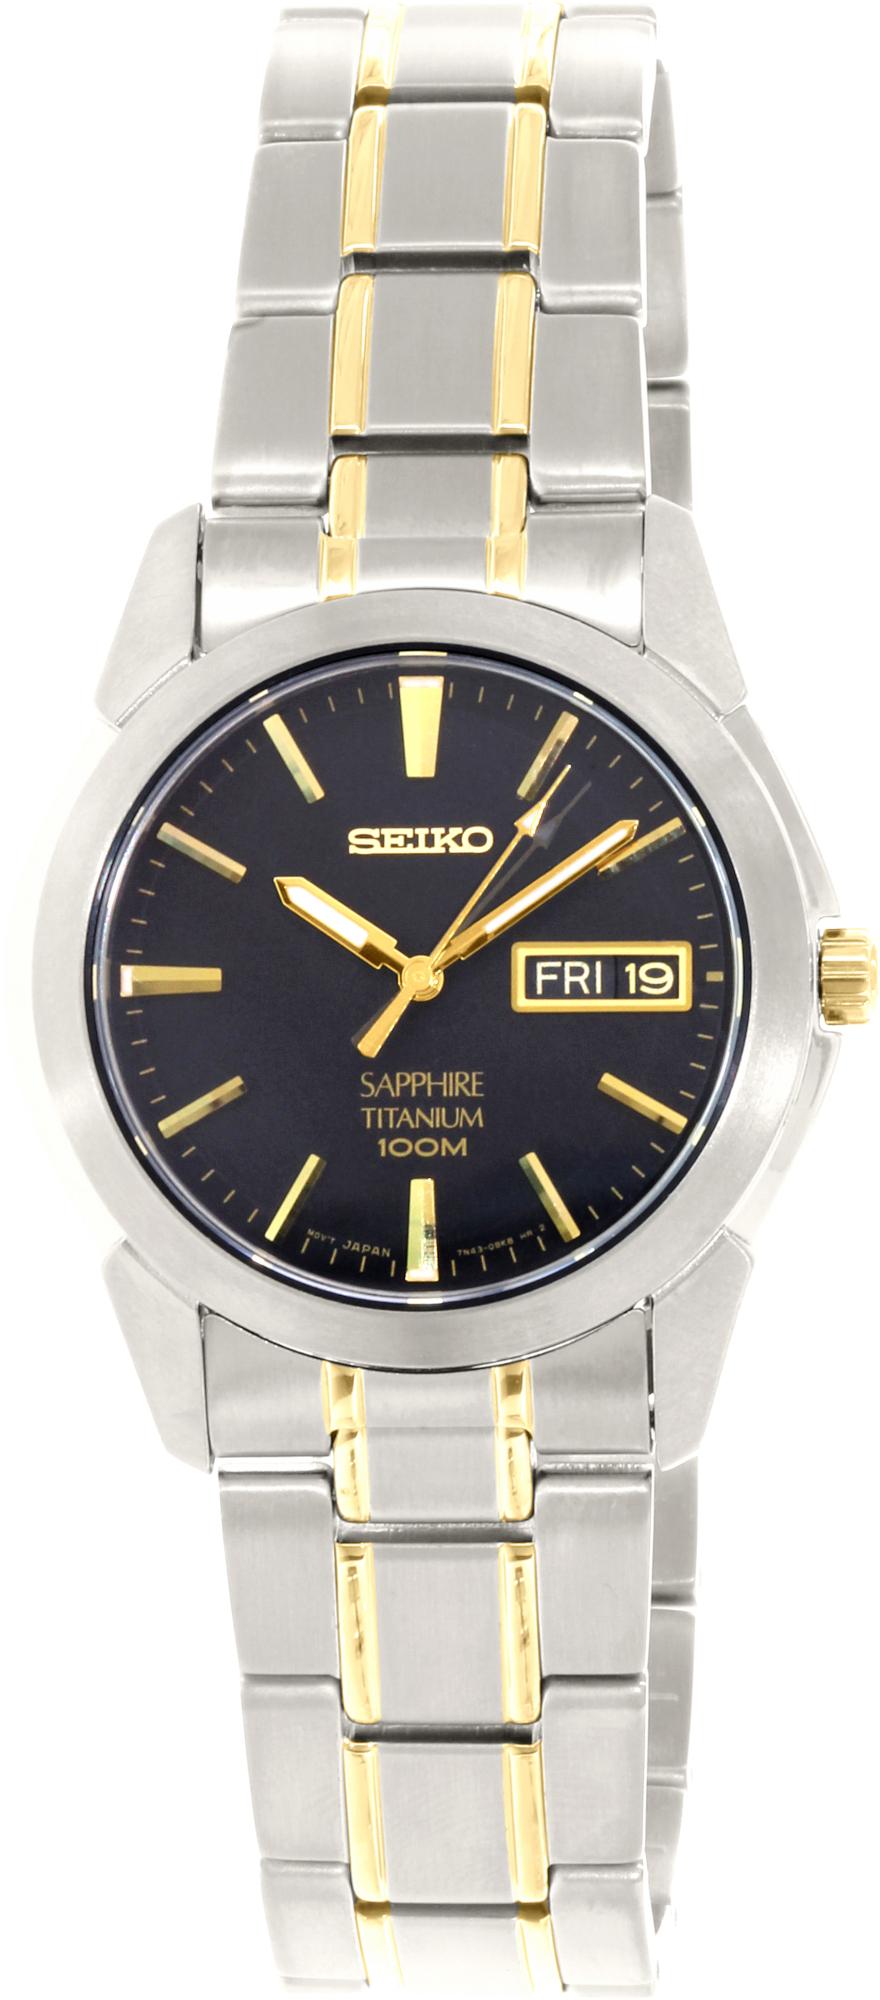 Seiko_Men's_SGG735_Silver_Titanium_Japanese_Quartz_Fashion_Watch